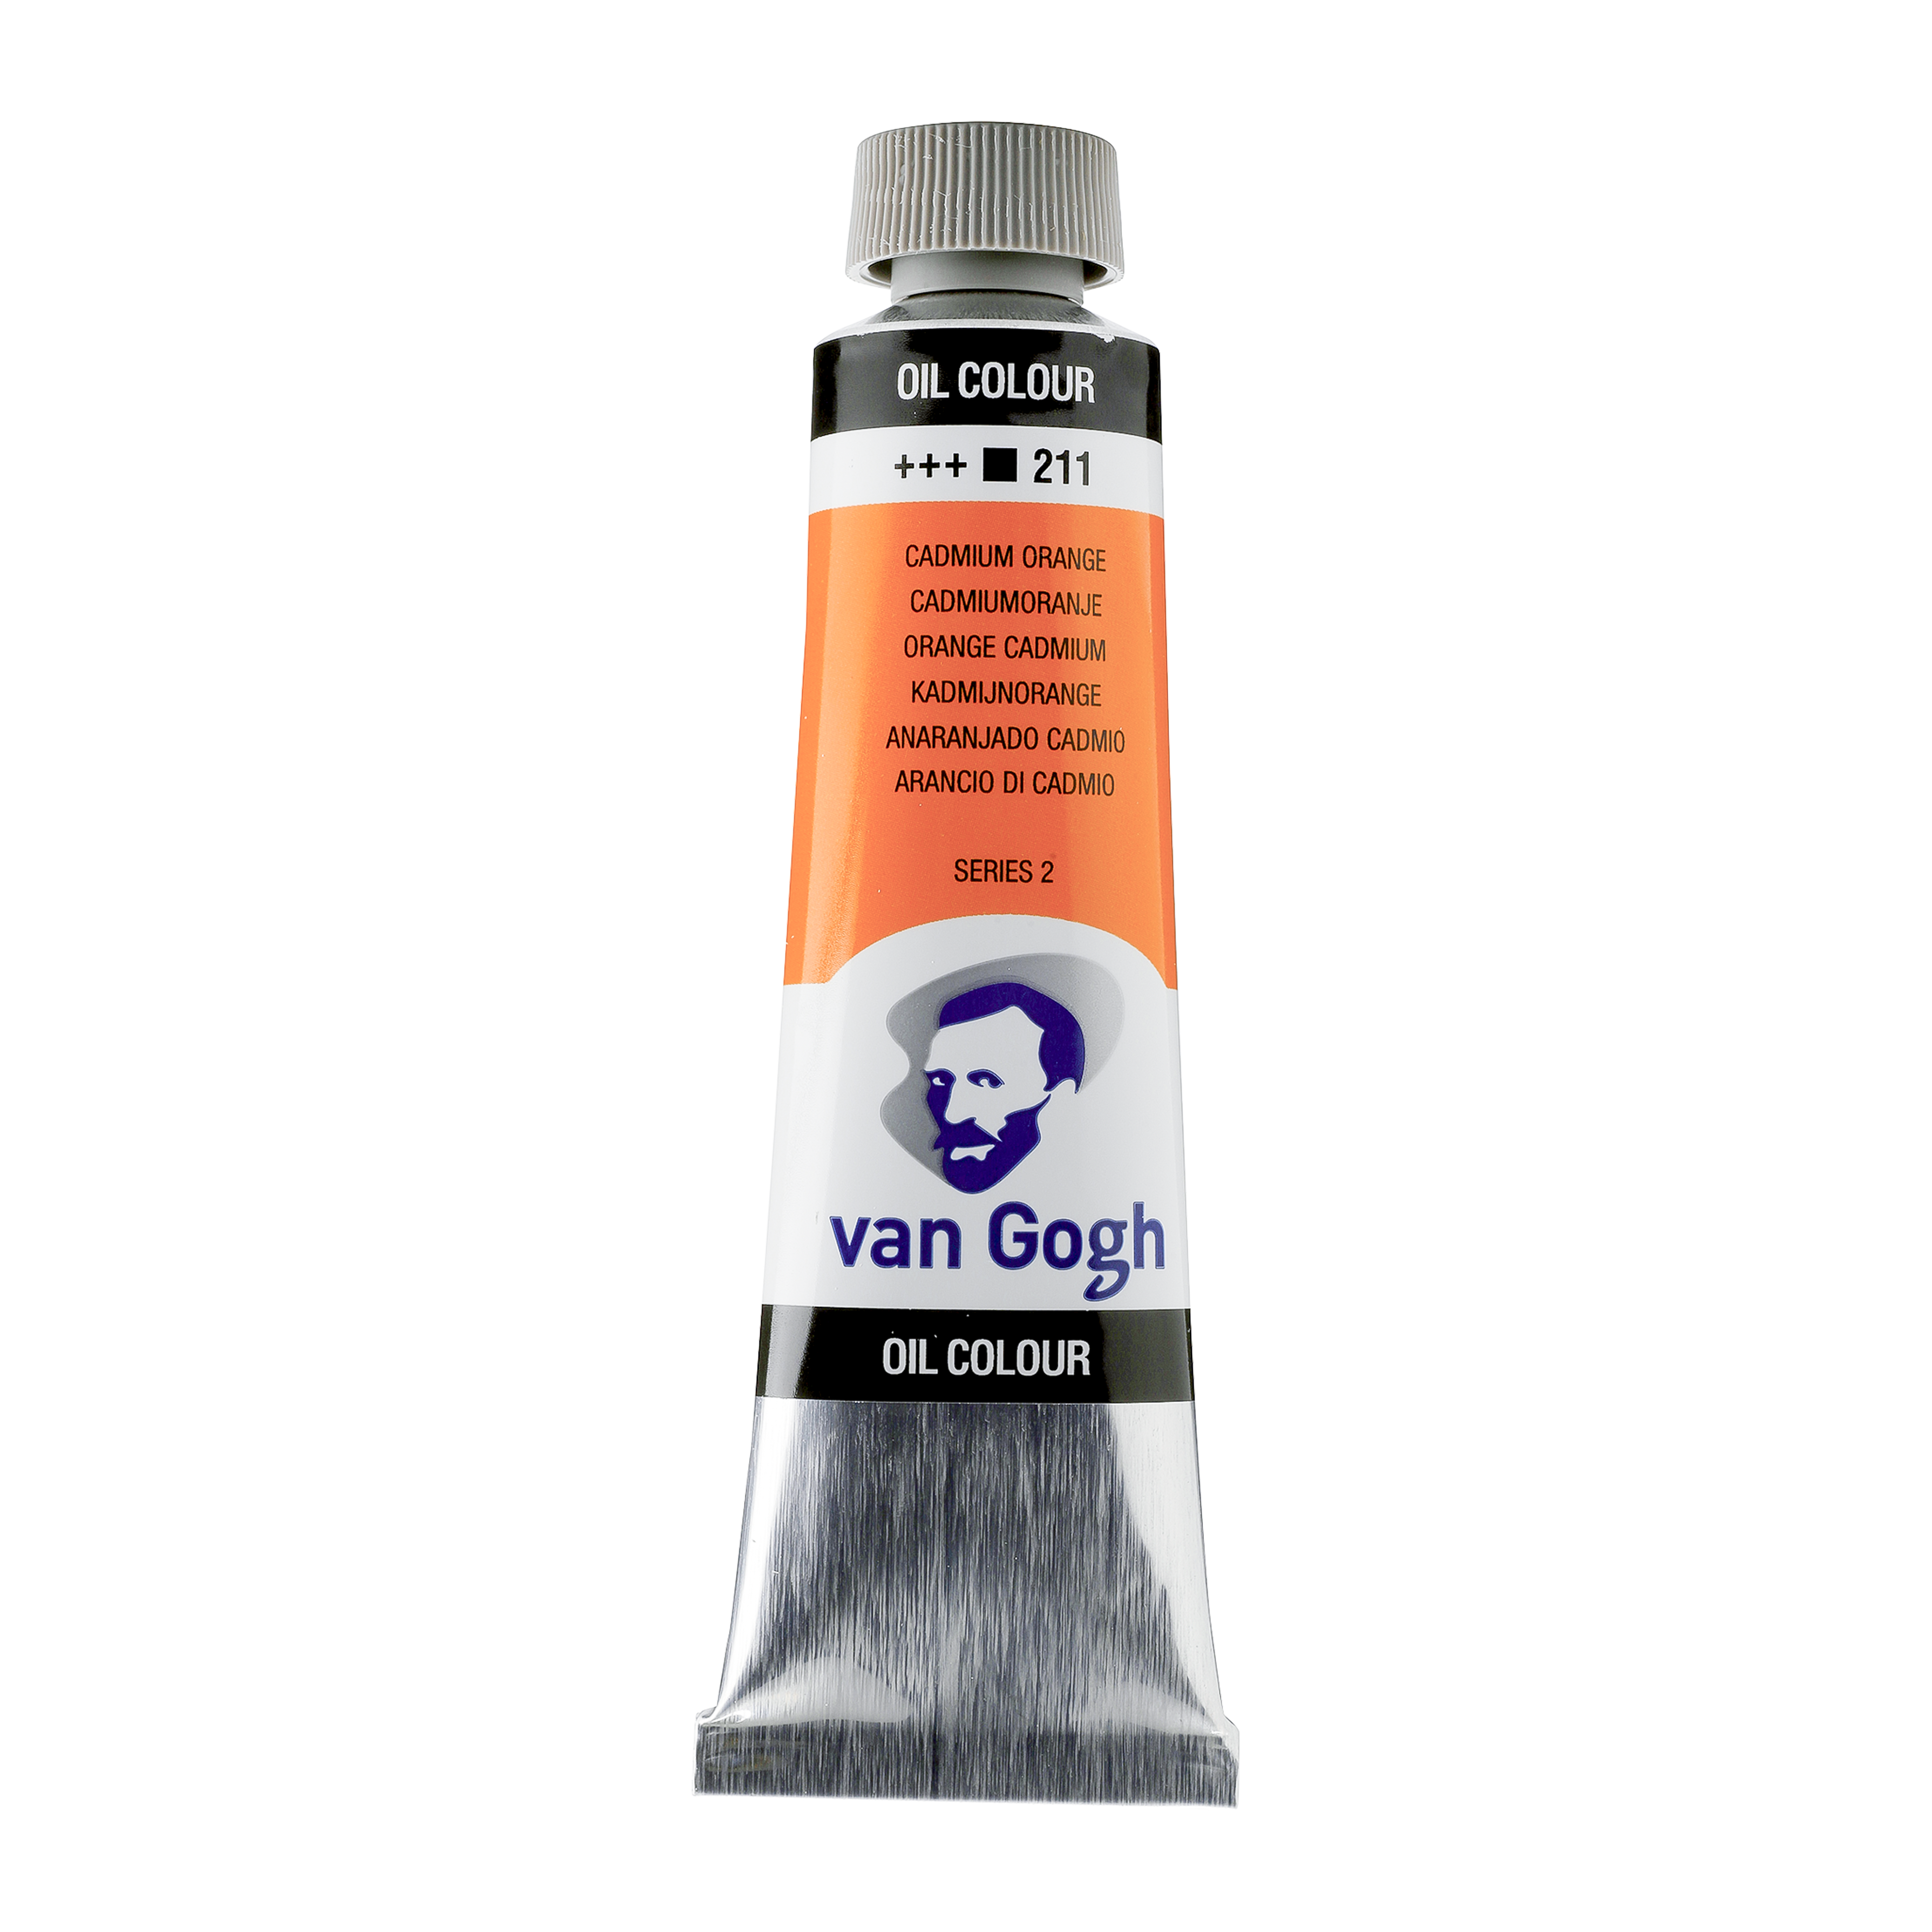 Õlivärv Van Gogh 40ml, 211 Cadmium Orange, soe kollakas oranz